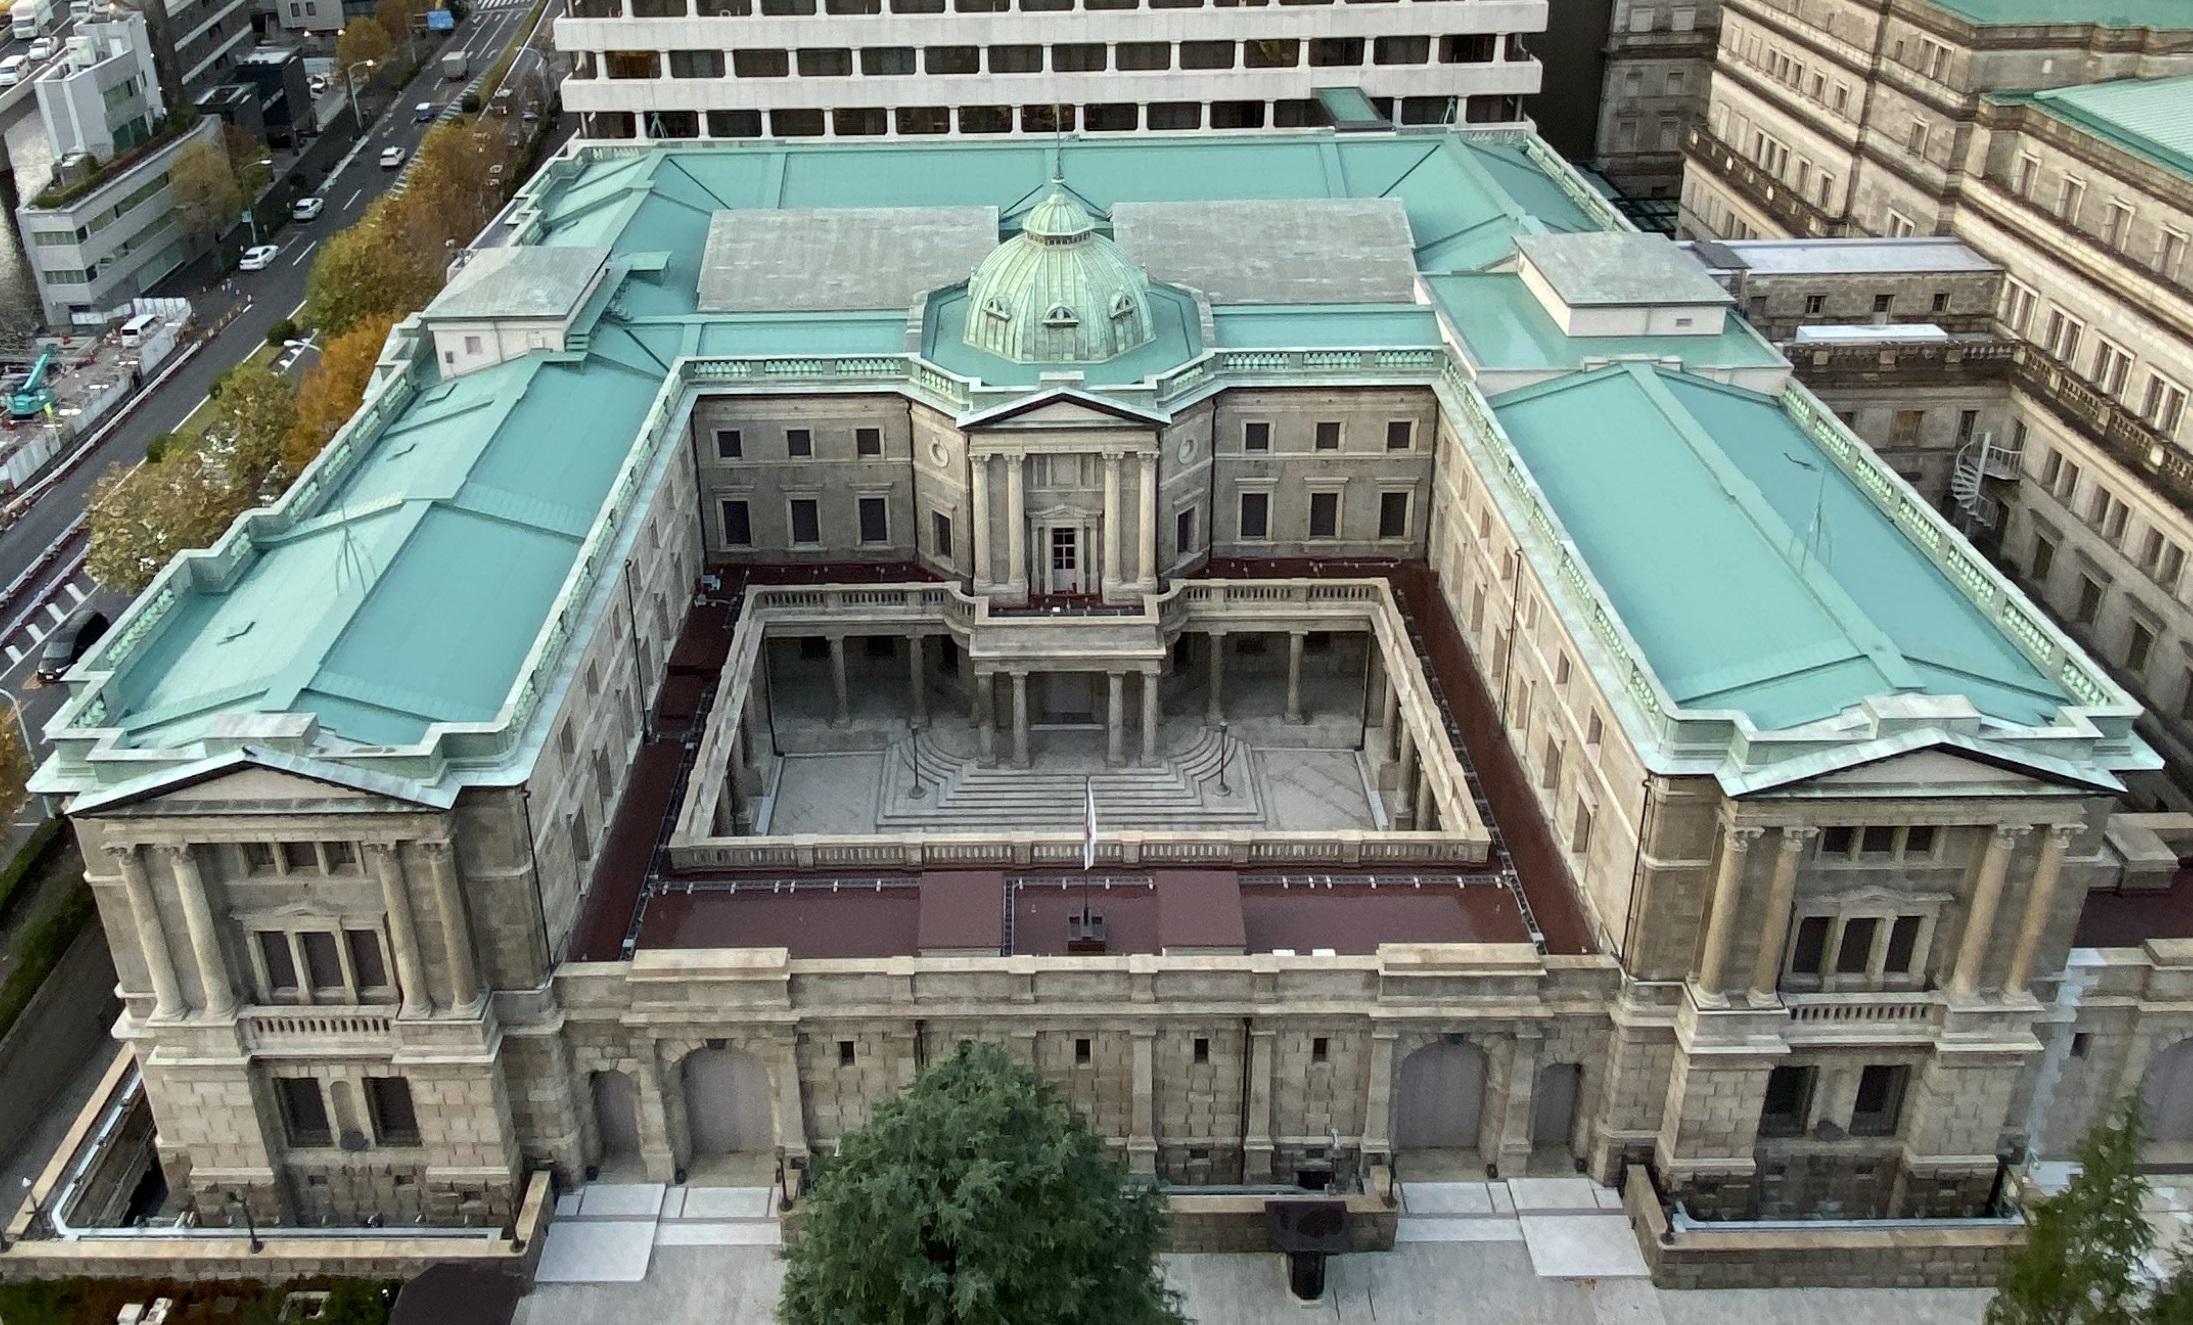 本店見学 : 日本銀行 Bank of Japan